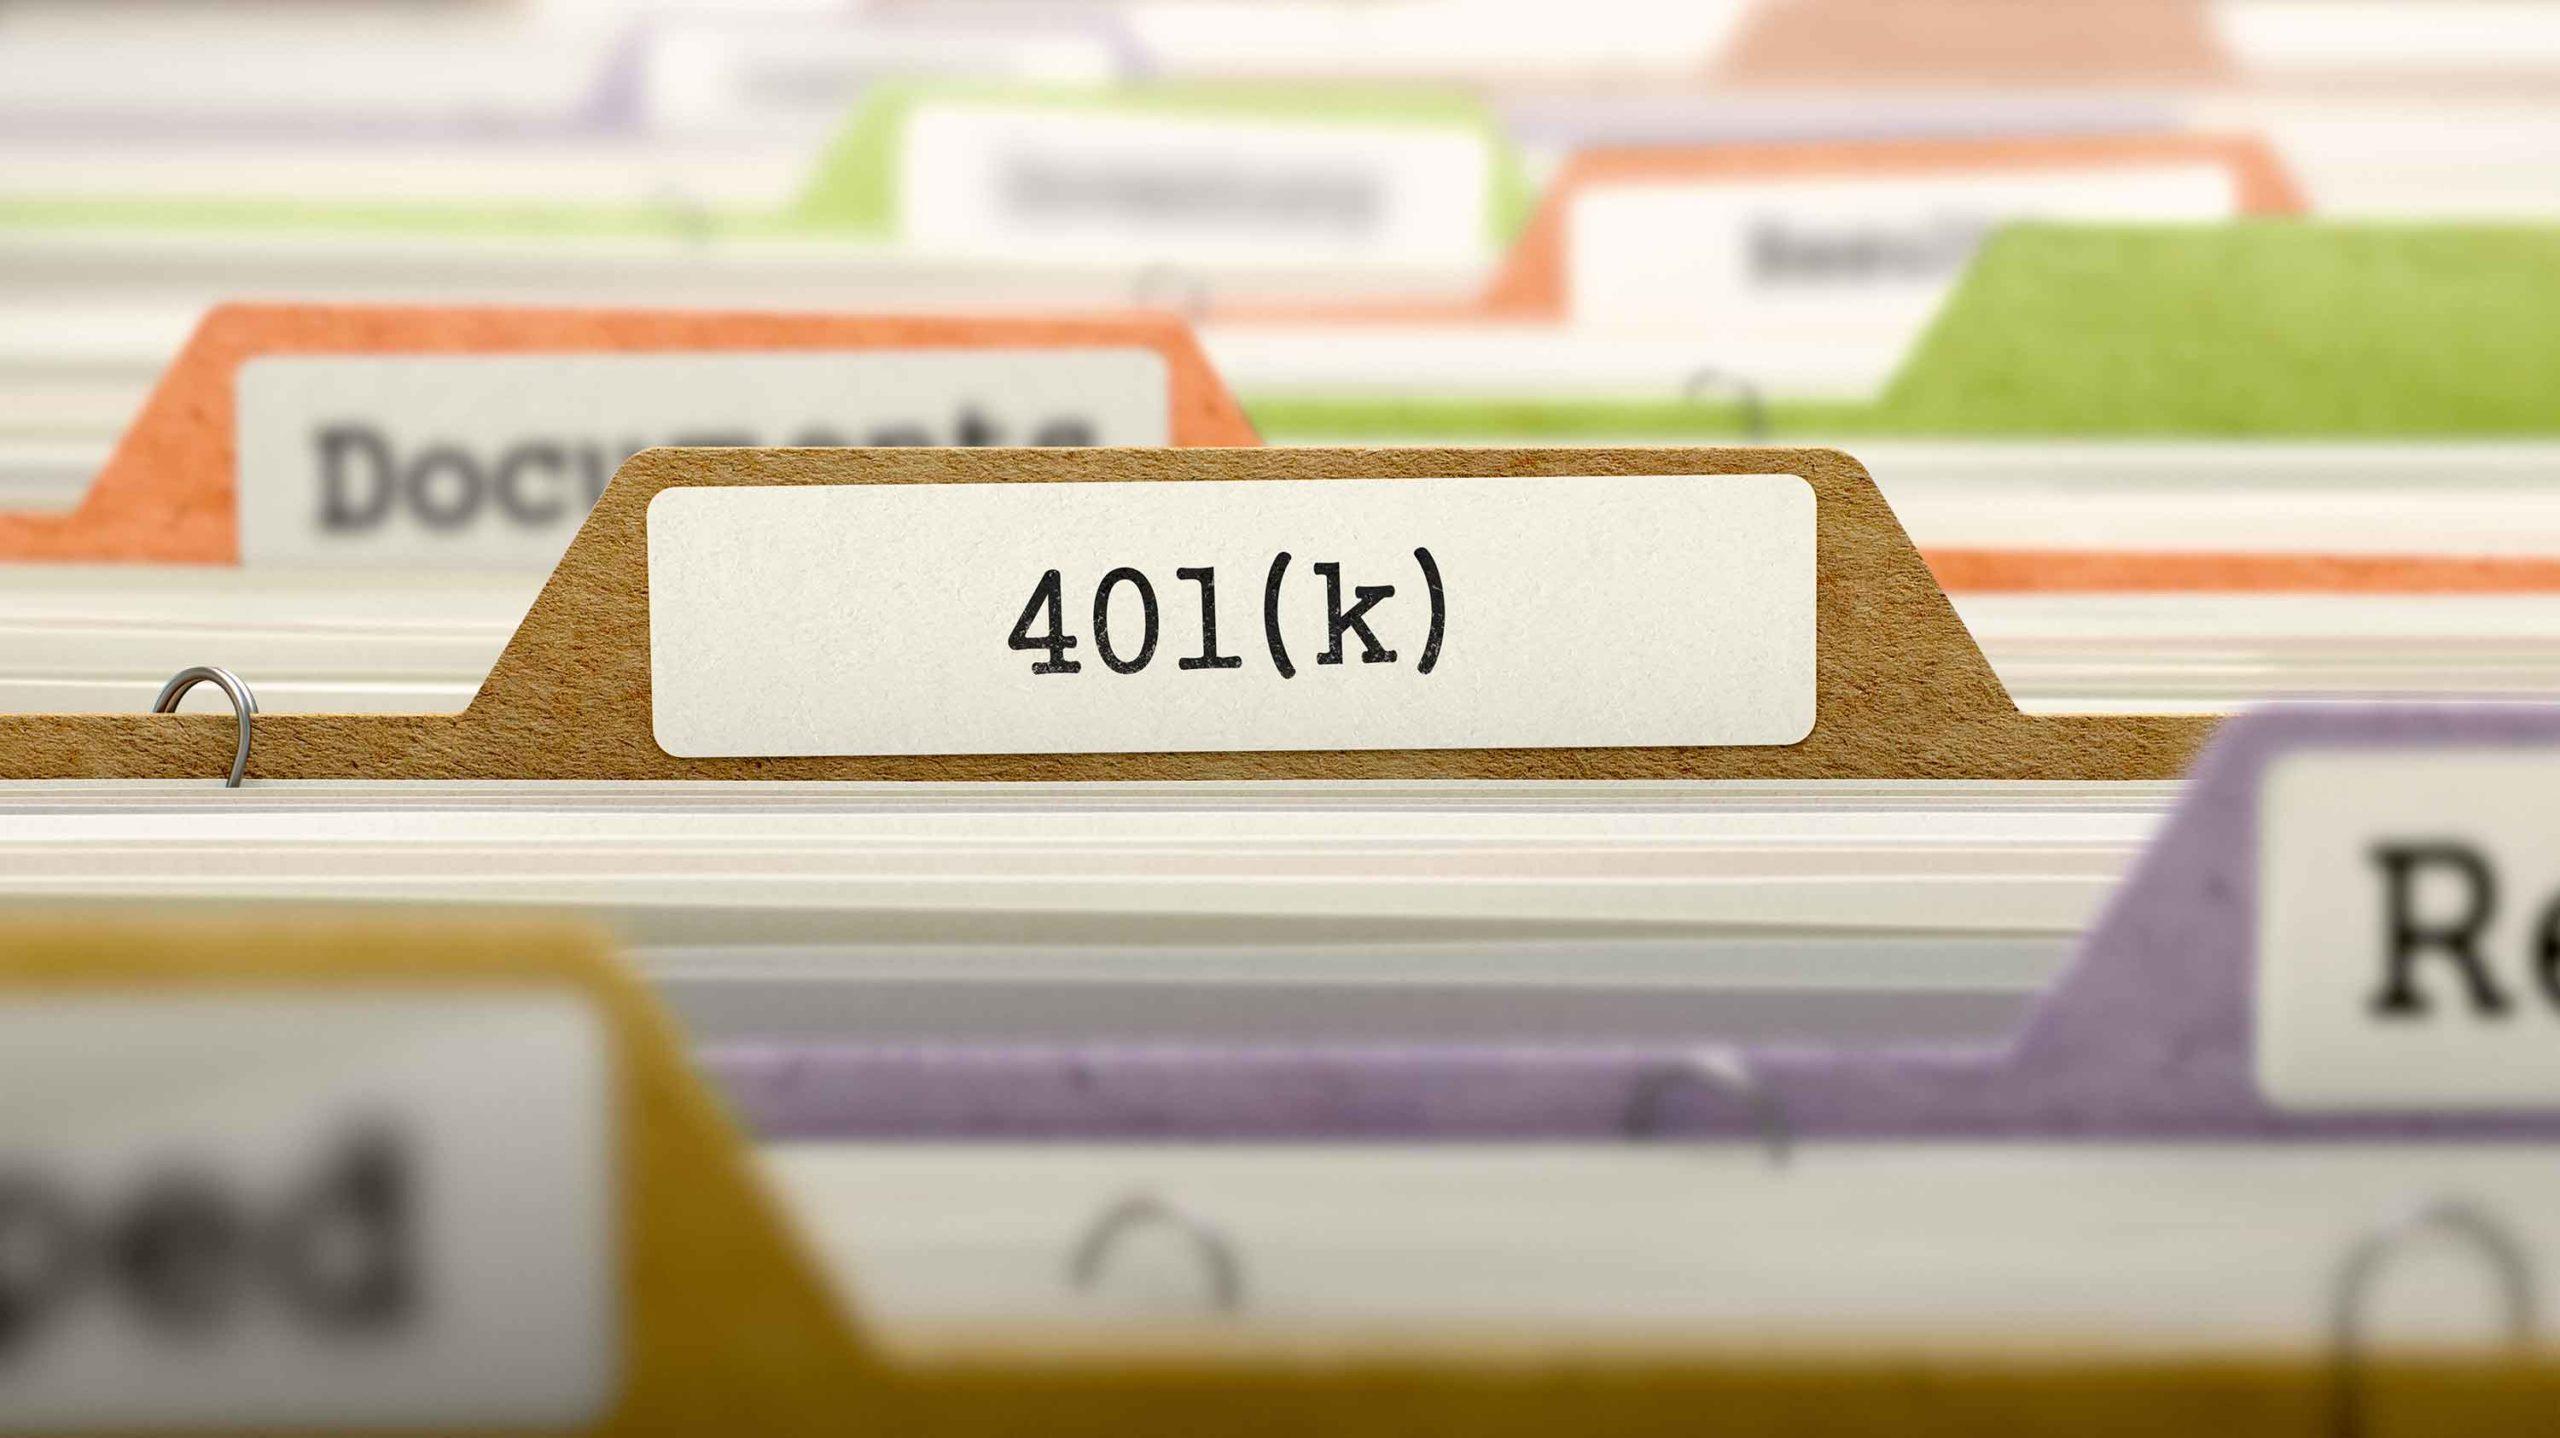 401(k) and SSDI